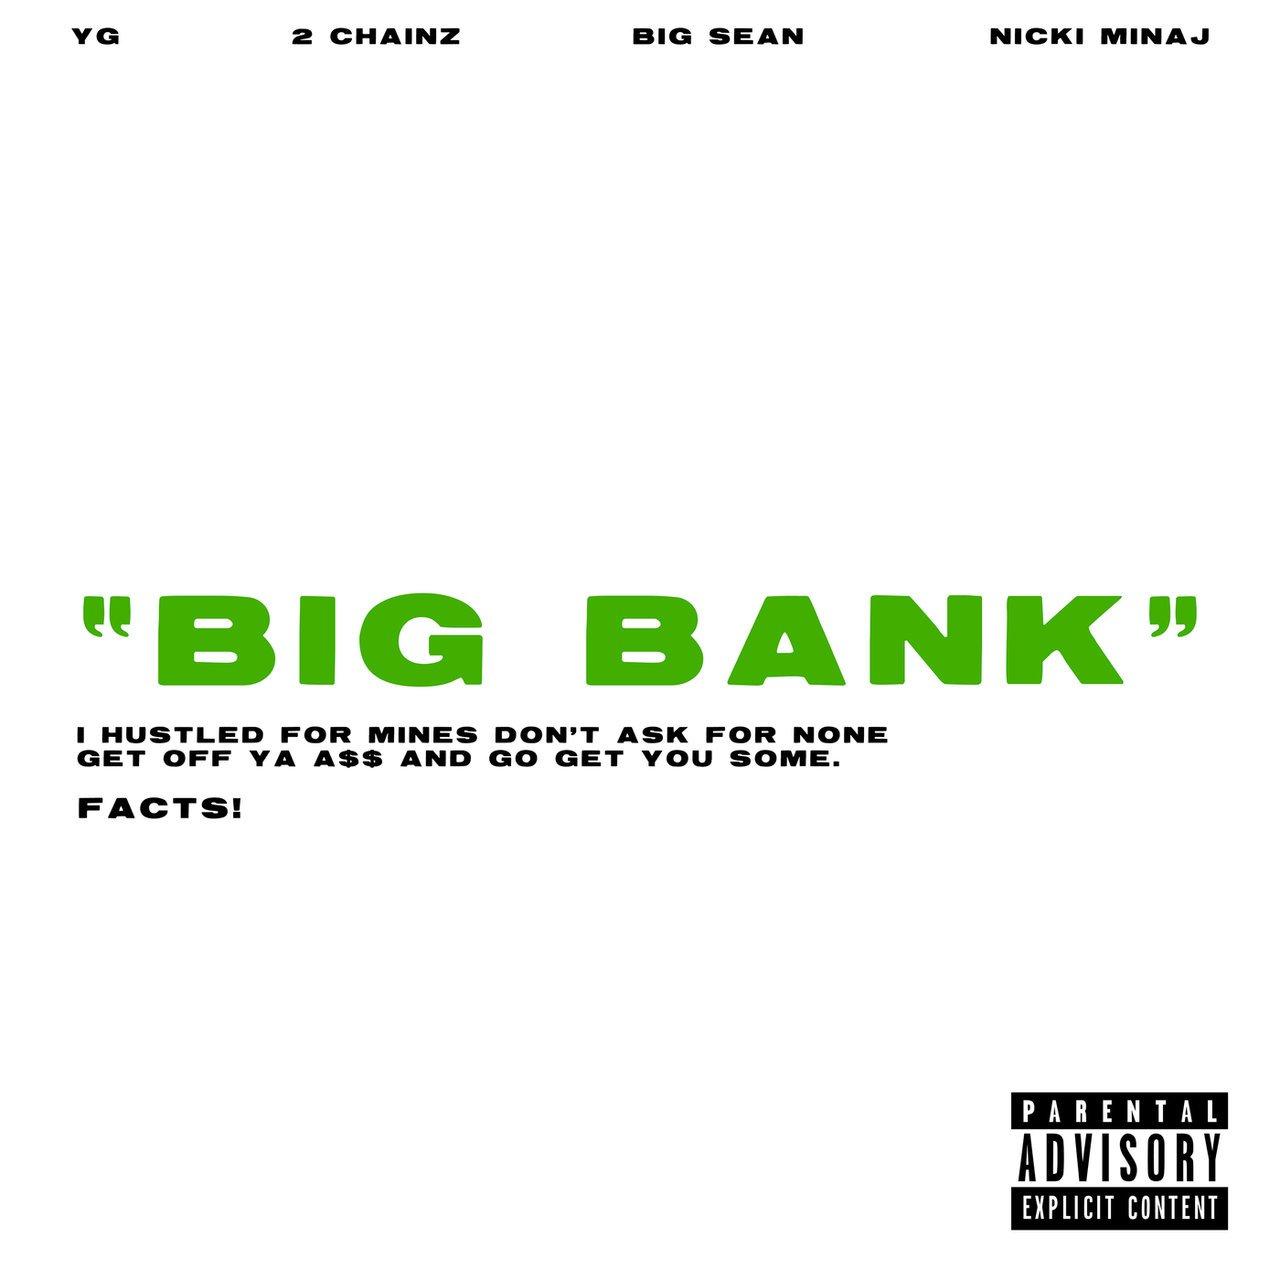 New Music: @YG Feat. @2Chainz, @BigSean & @NICKIMINAJ 'Big Bank' https://t.co/AD8kg3eJG9  �� https://t.co/qFdubGFJrZ